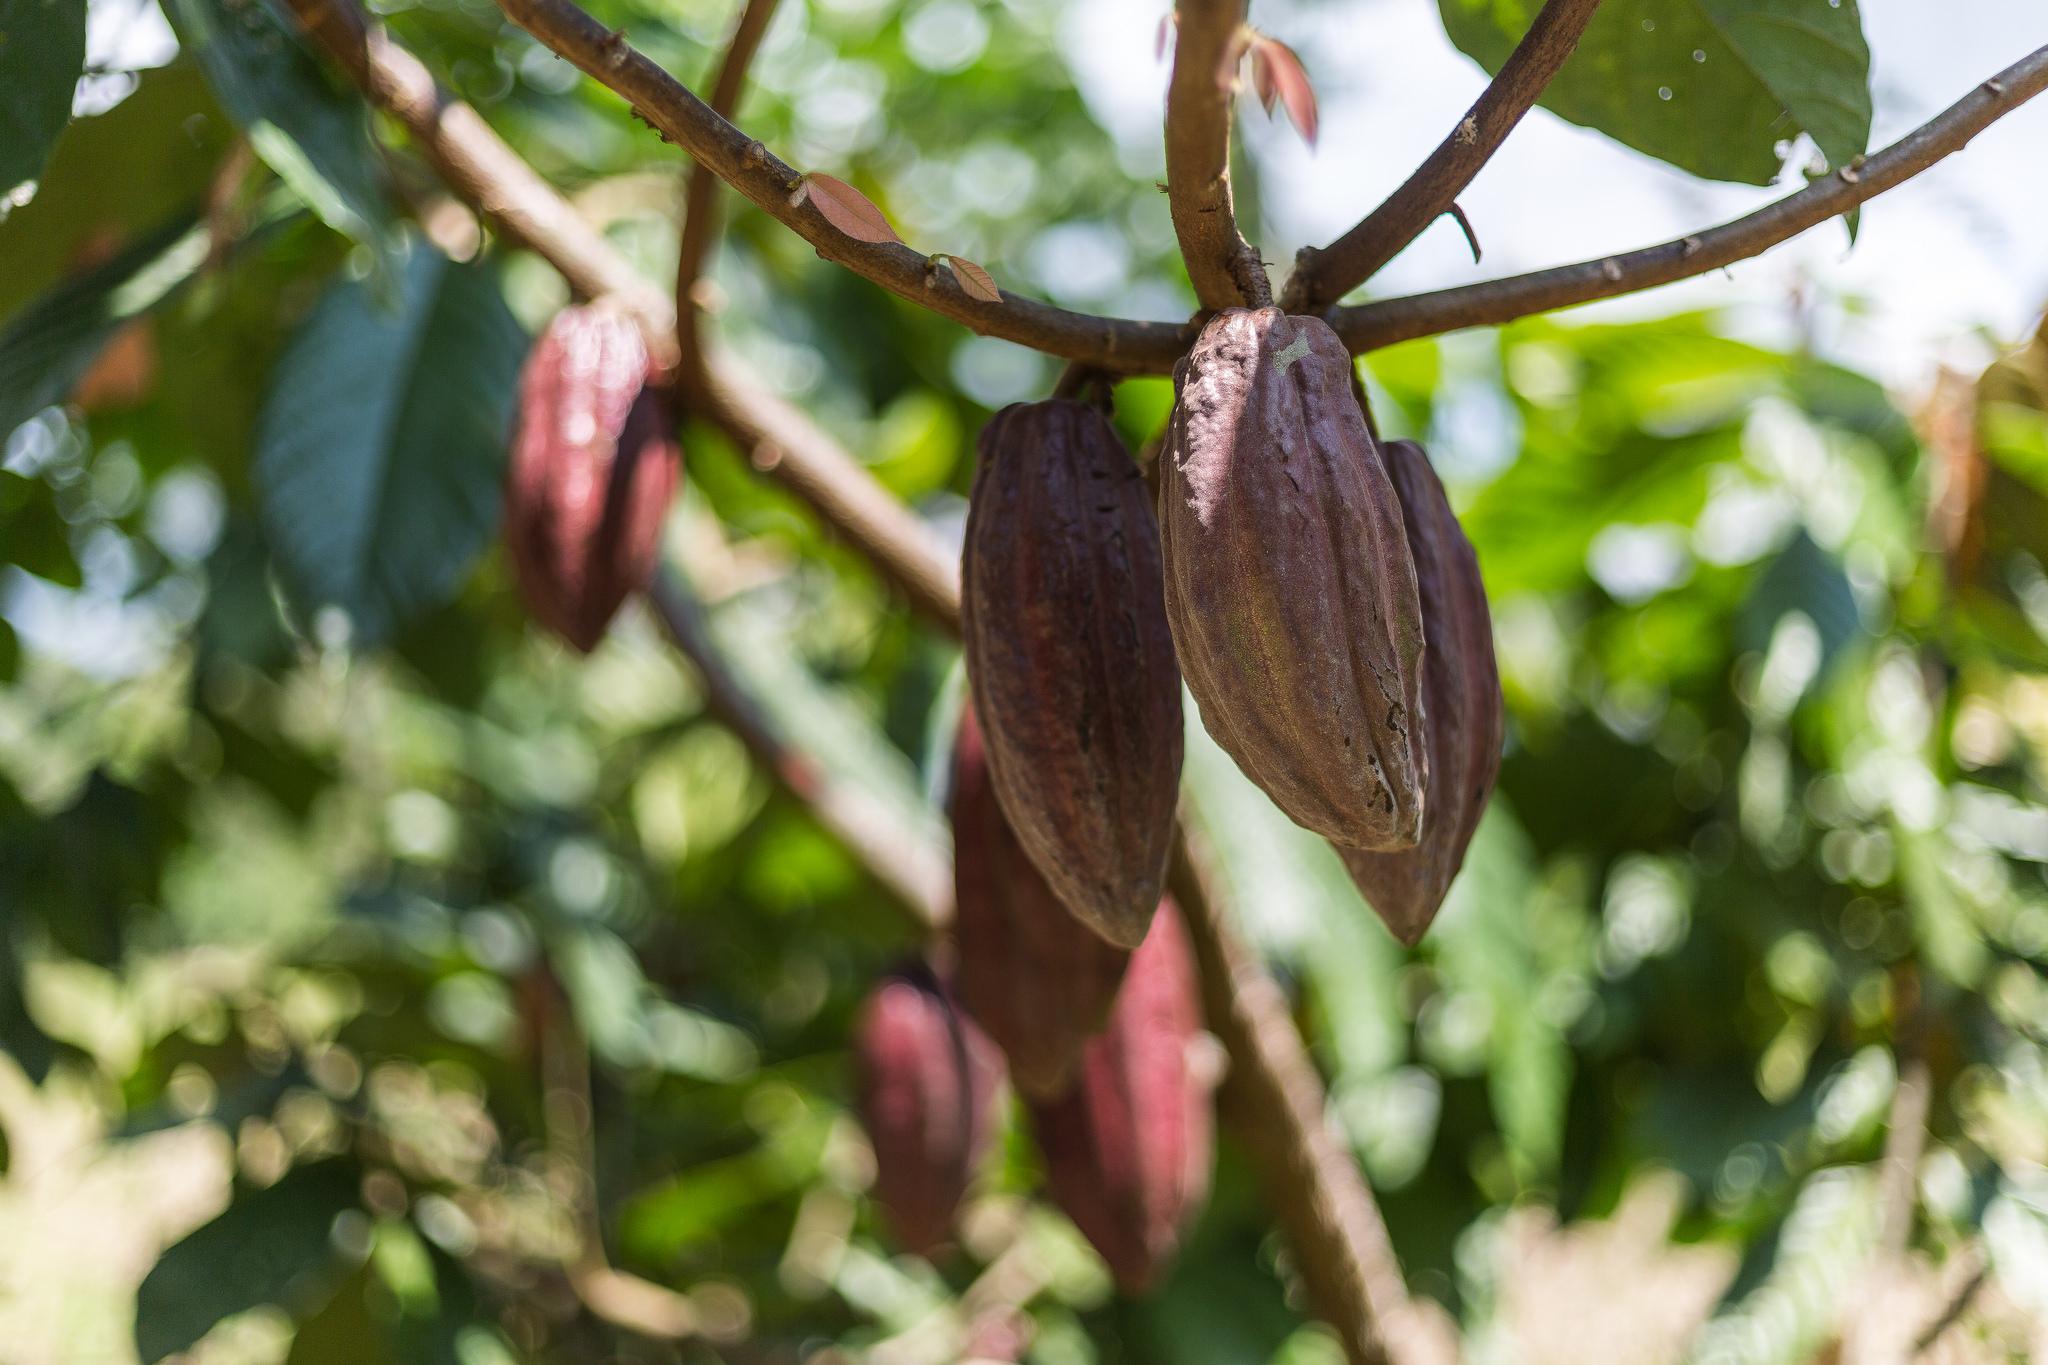 Kakaobohnen im Wald